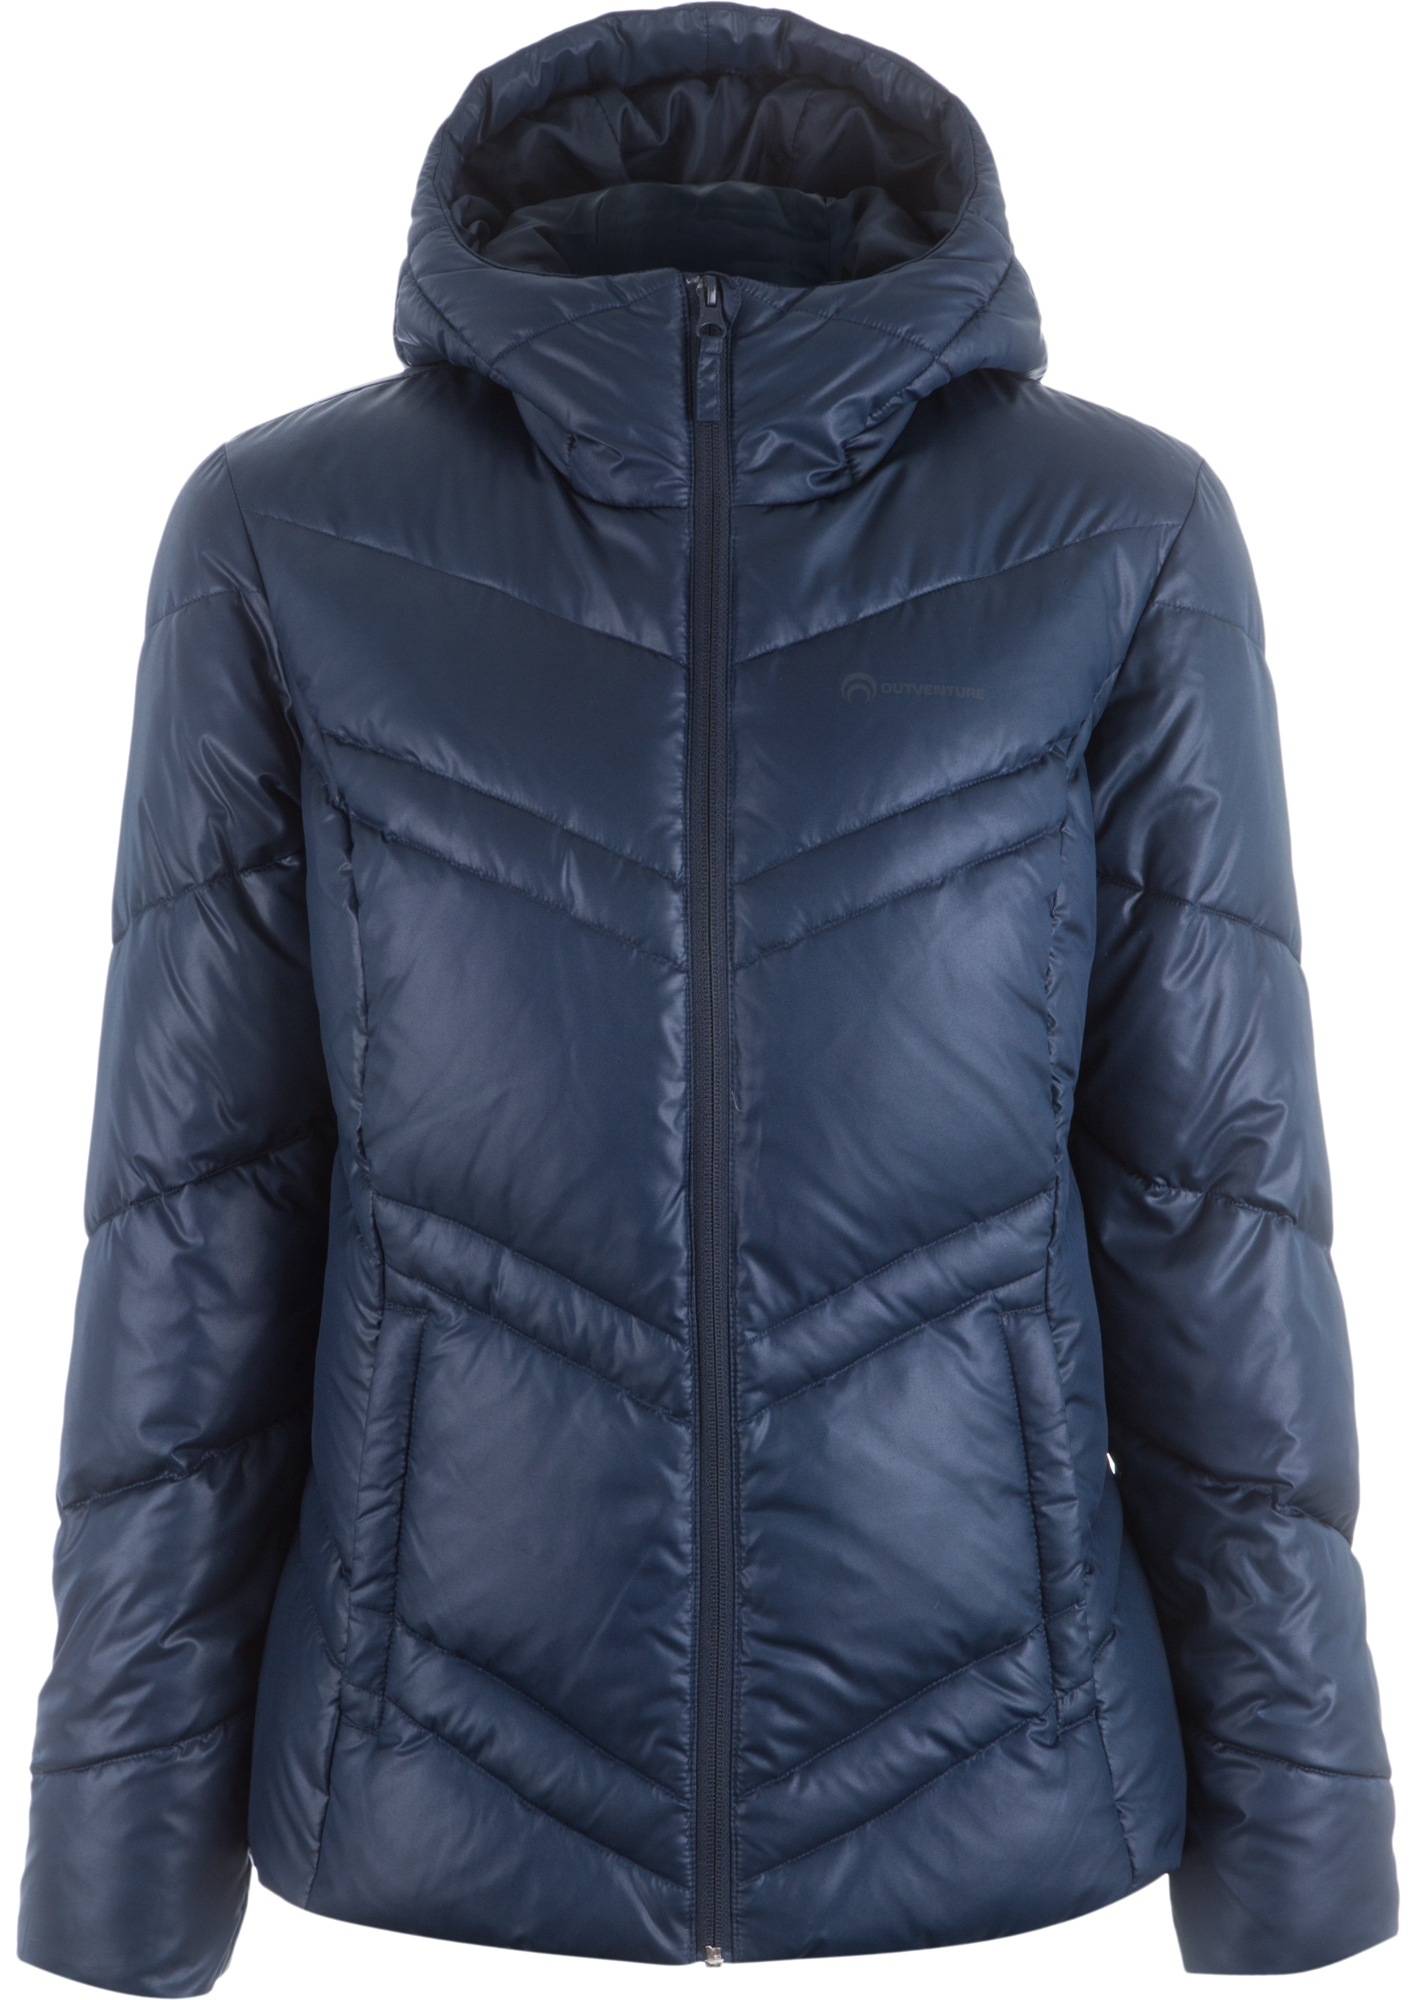 Outventure Куртка пуховая женская Outventure, размер 52 pajar куртка пуховая женская cougar xl jet black